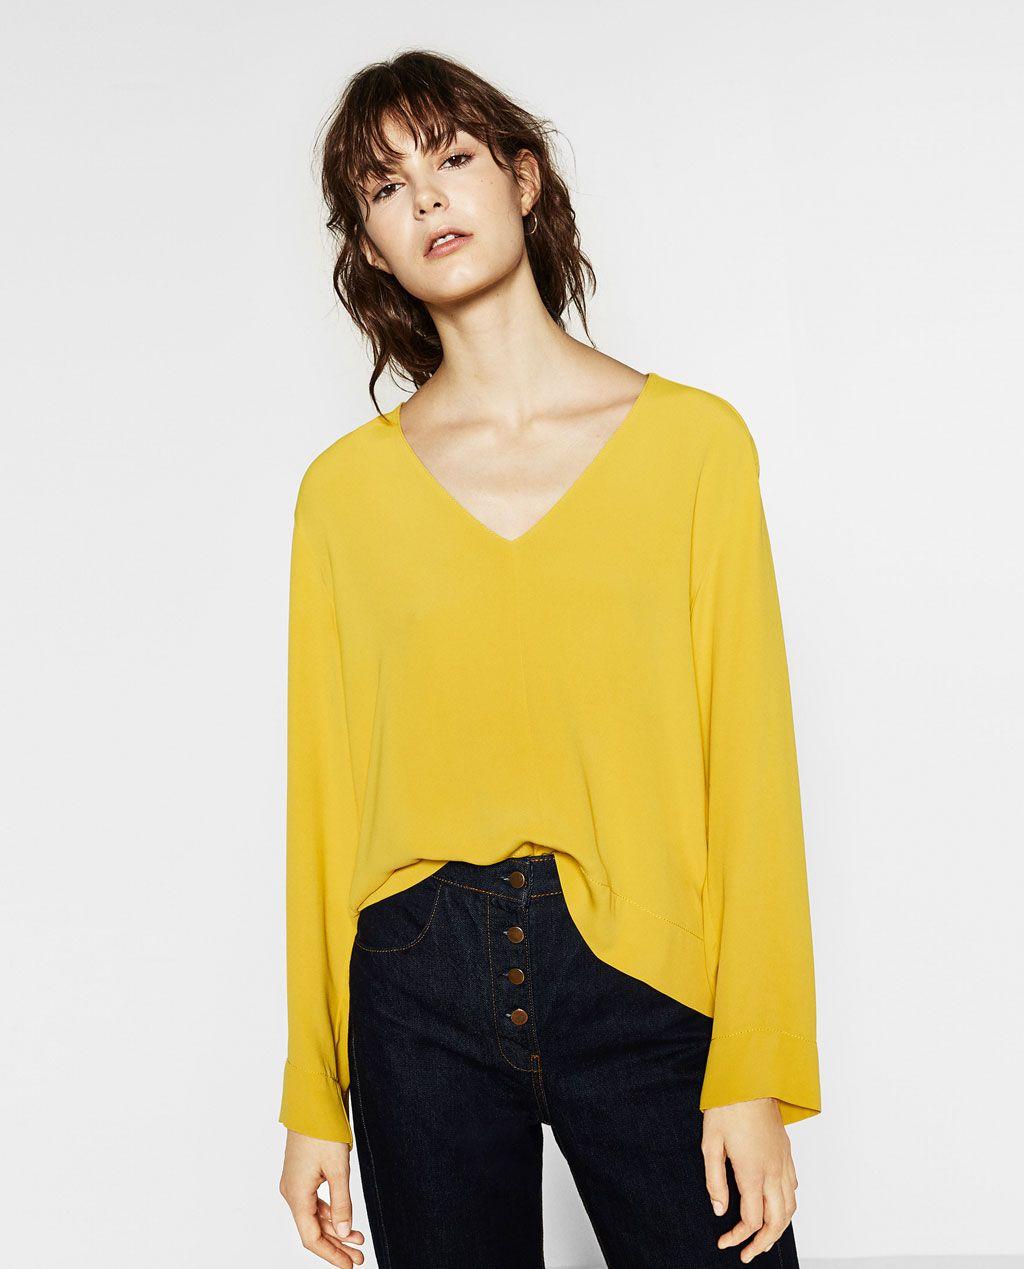 Blusas femeninas 2018 moda Blusas y Blusas florales Mujer